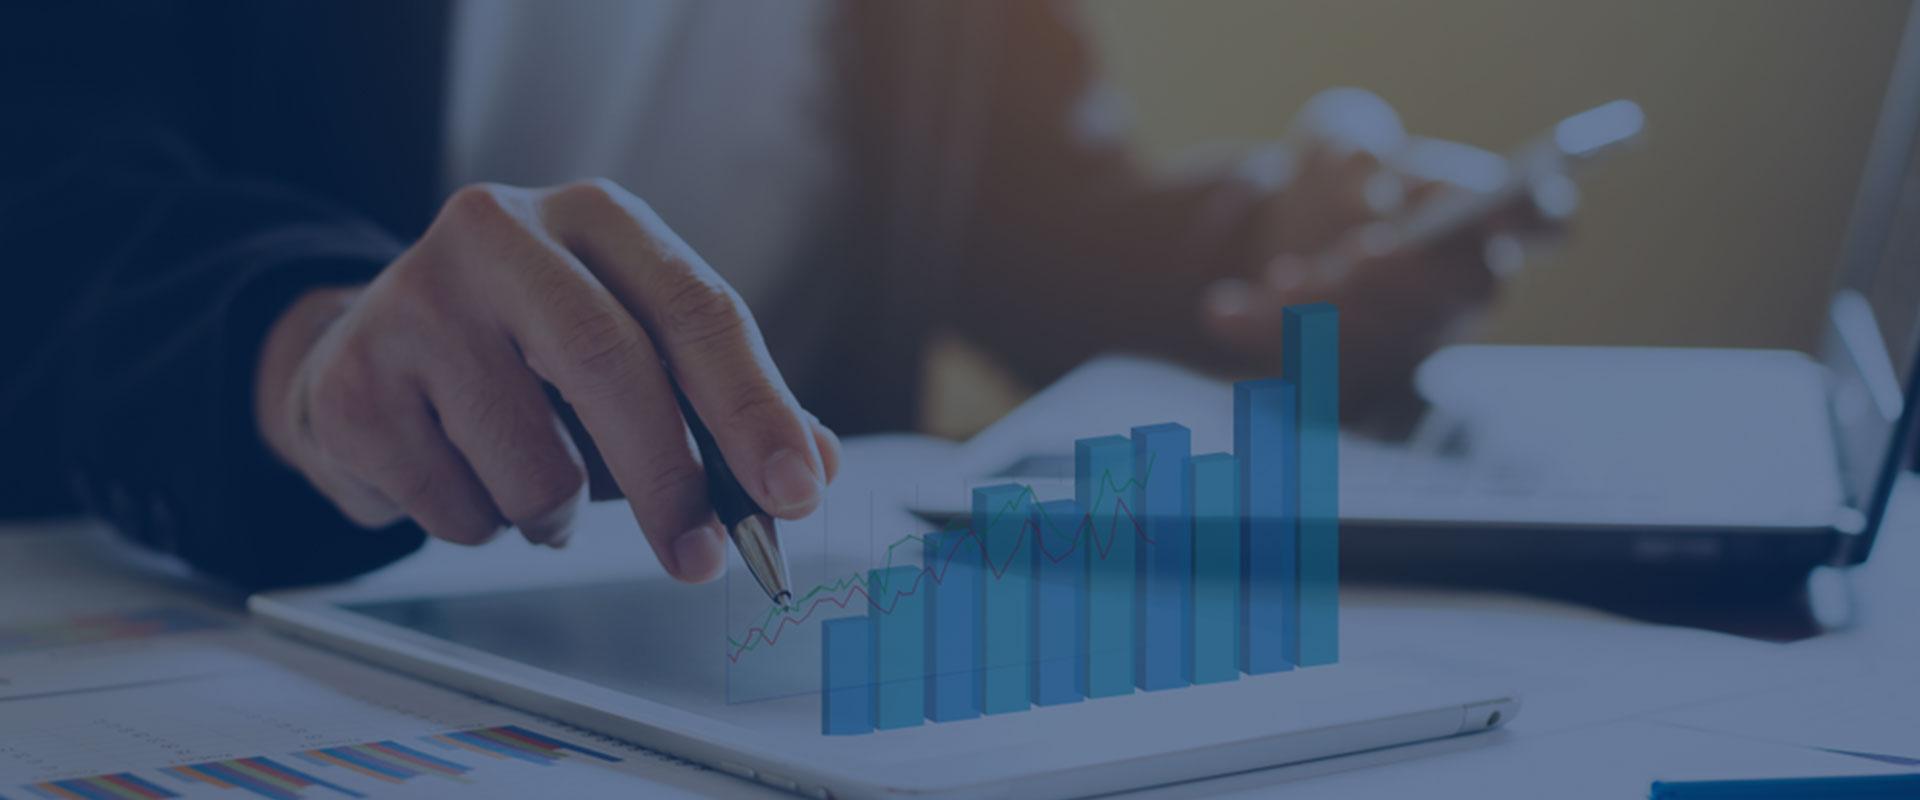 pericia-contabil-expert-pericias